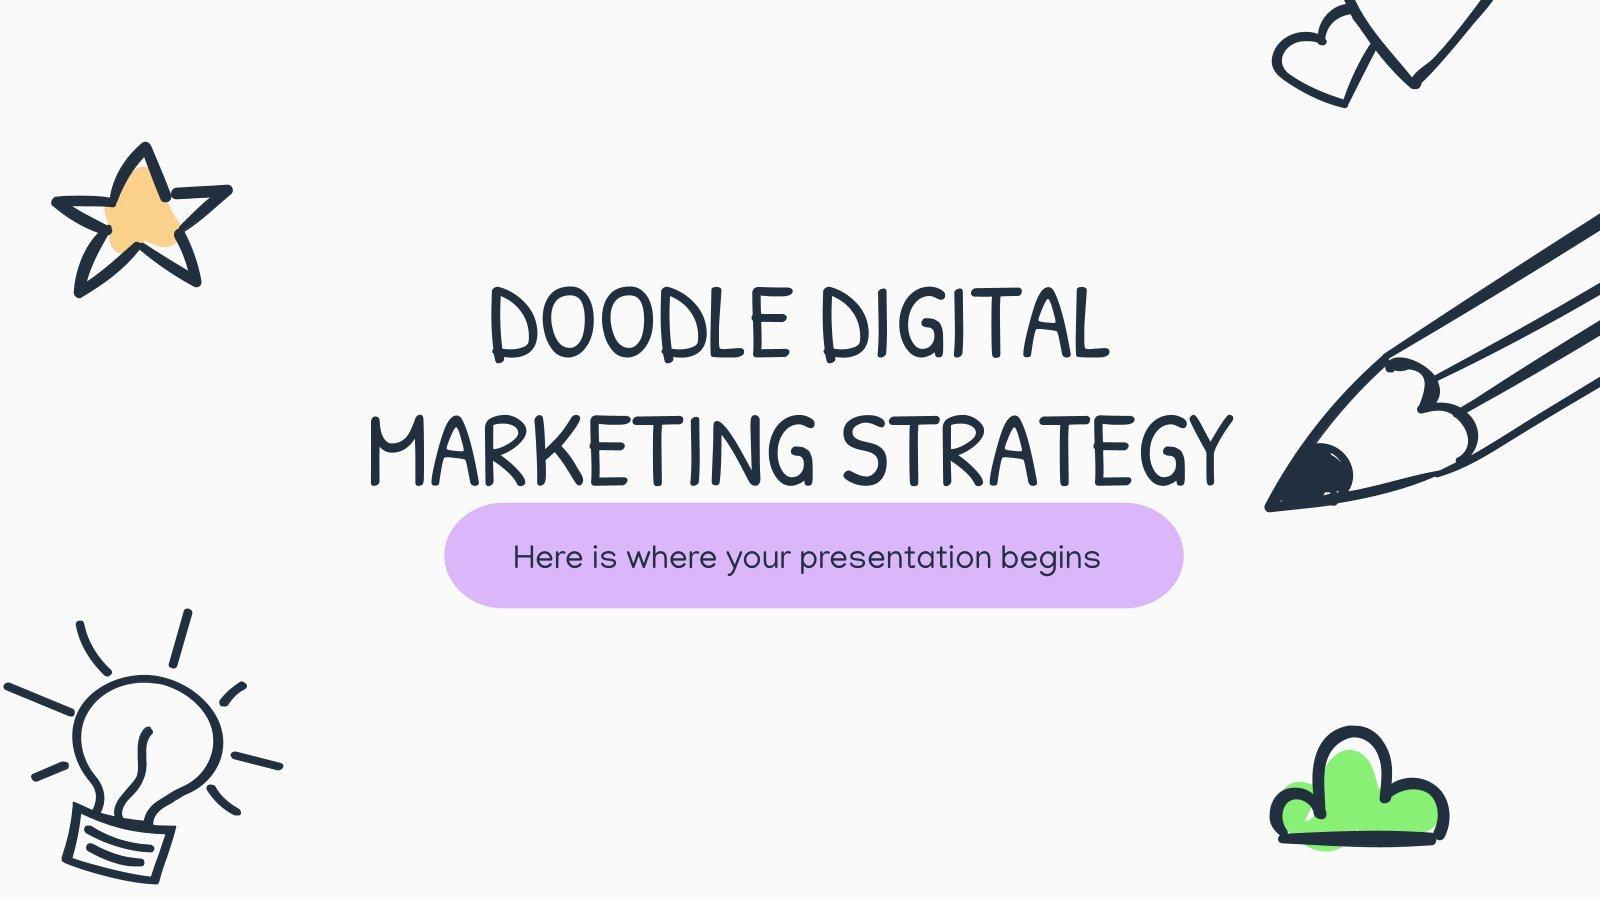 Doodle Digital Marketing Strategy presentation template